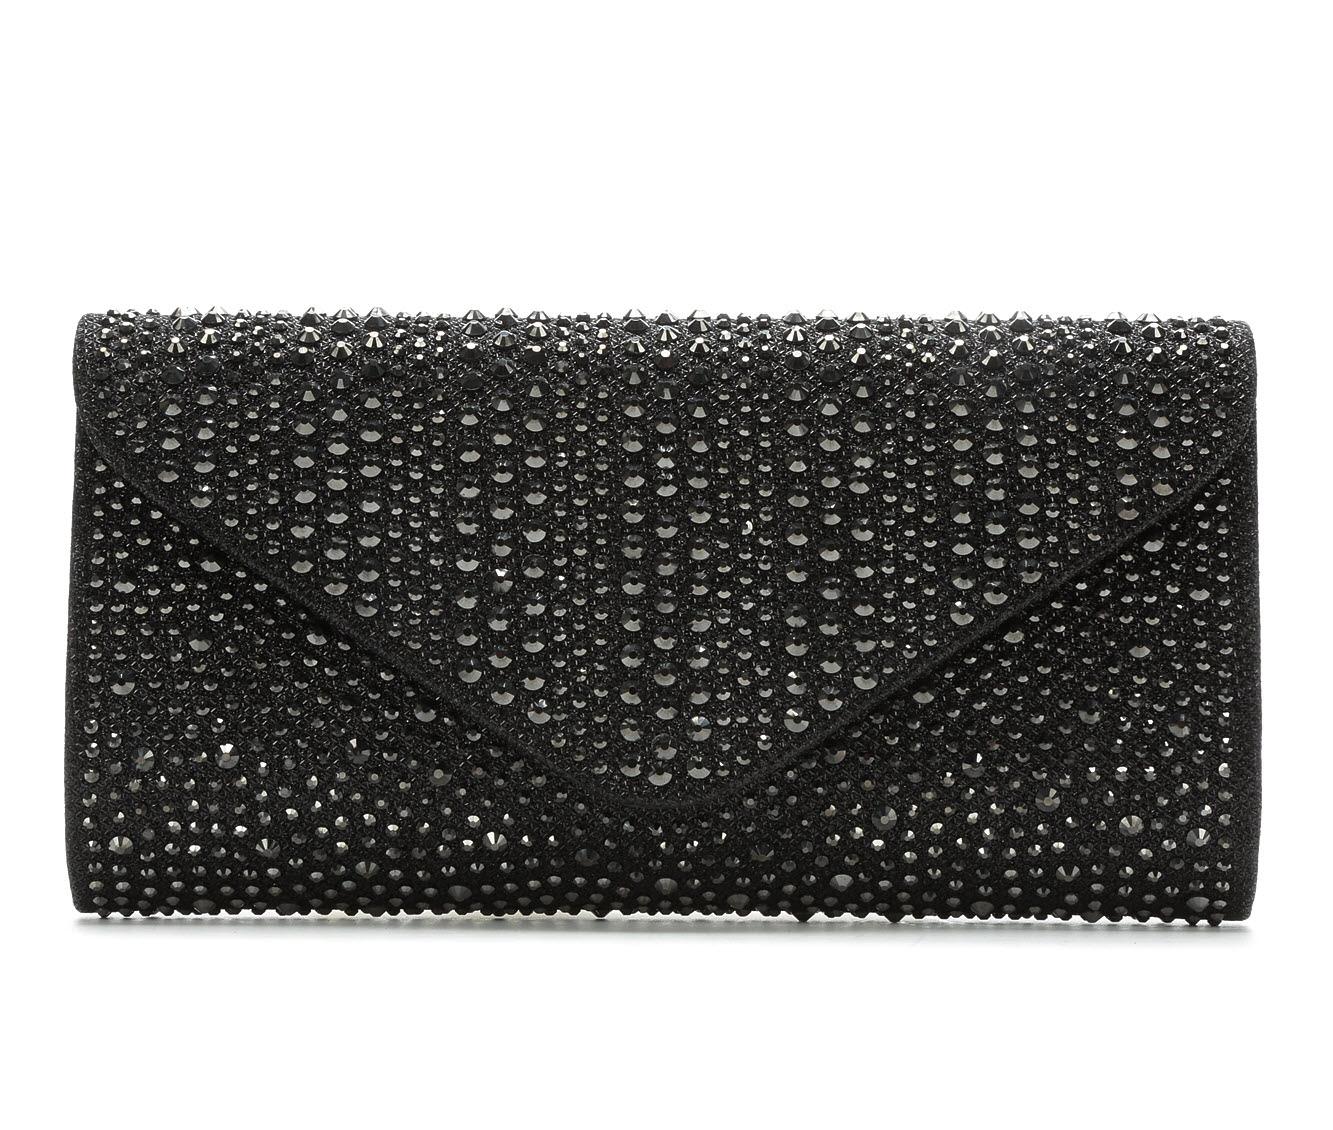 LLorraine Studded Envelope (Black)